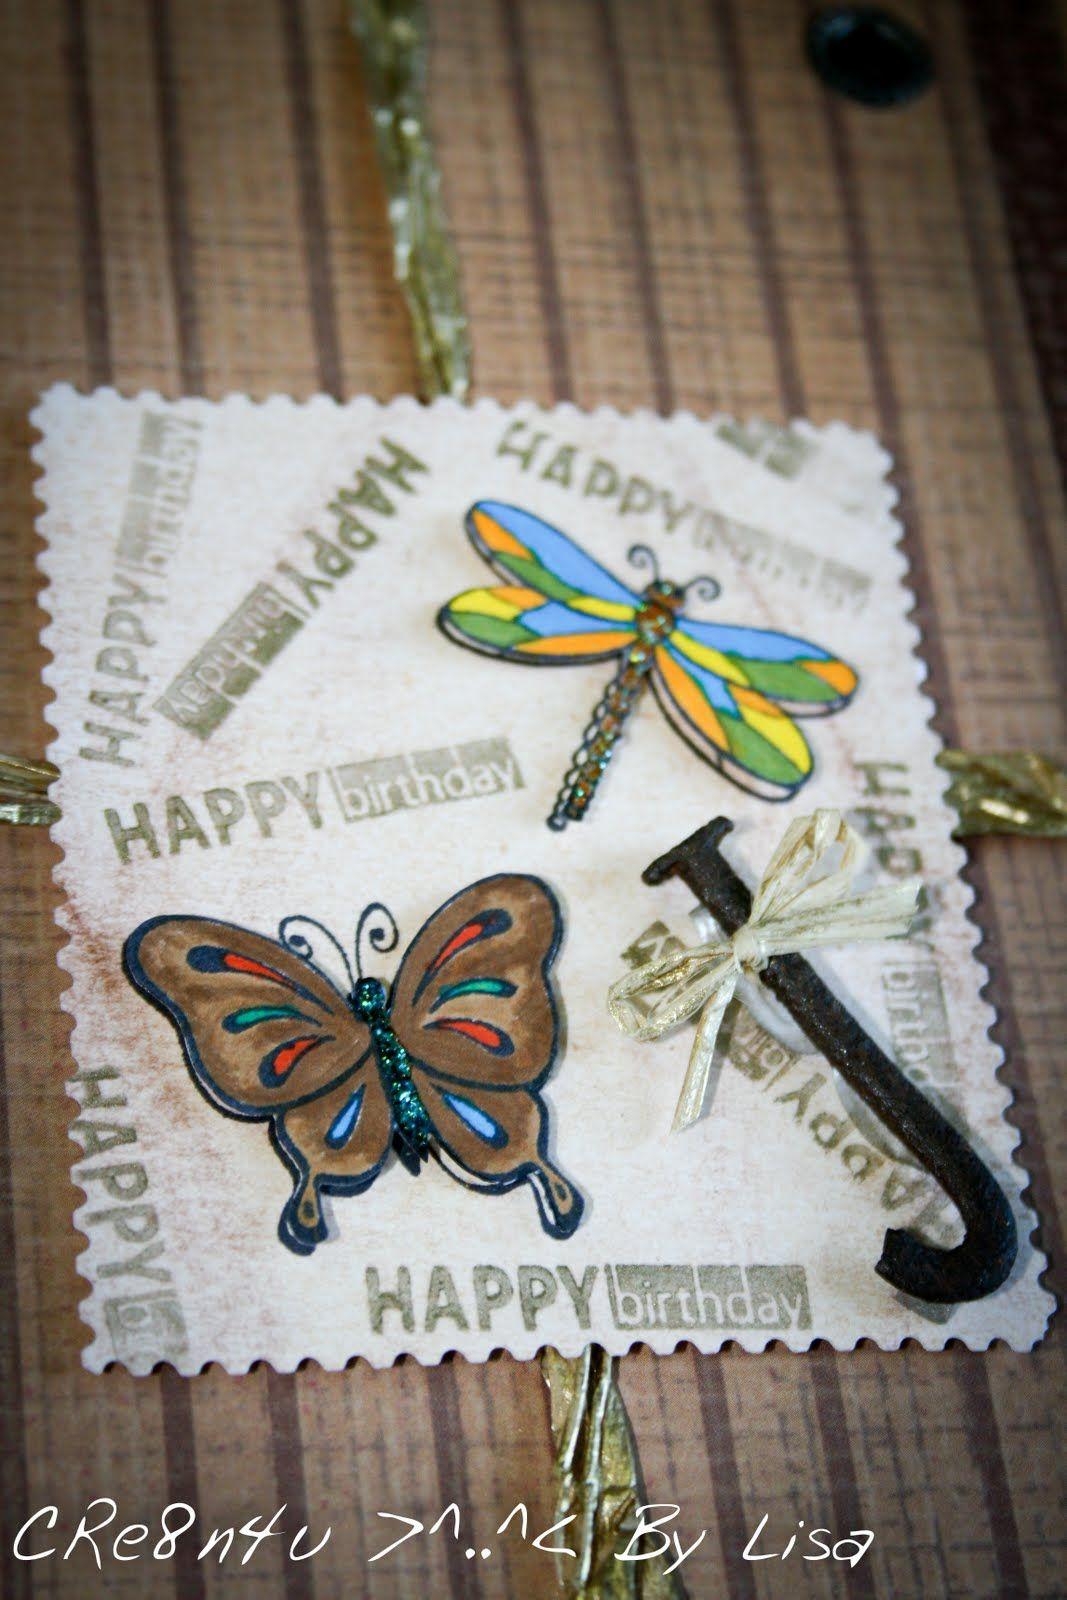 Crenu handmade creations by lisa birthday cards crenu